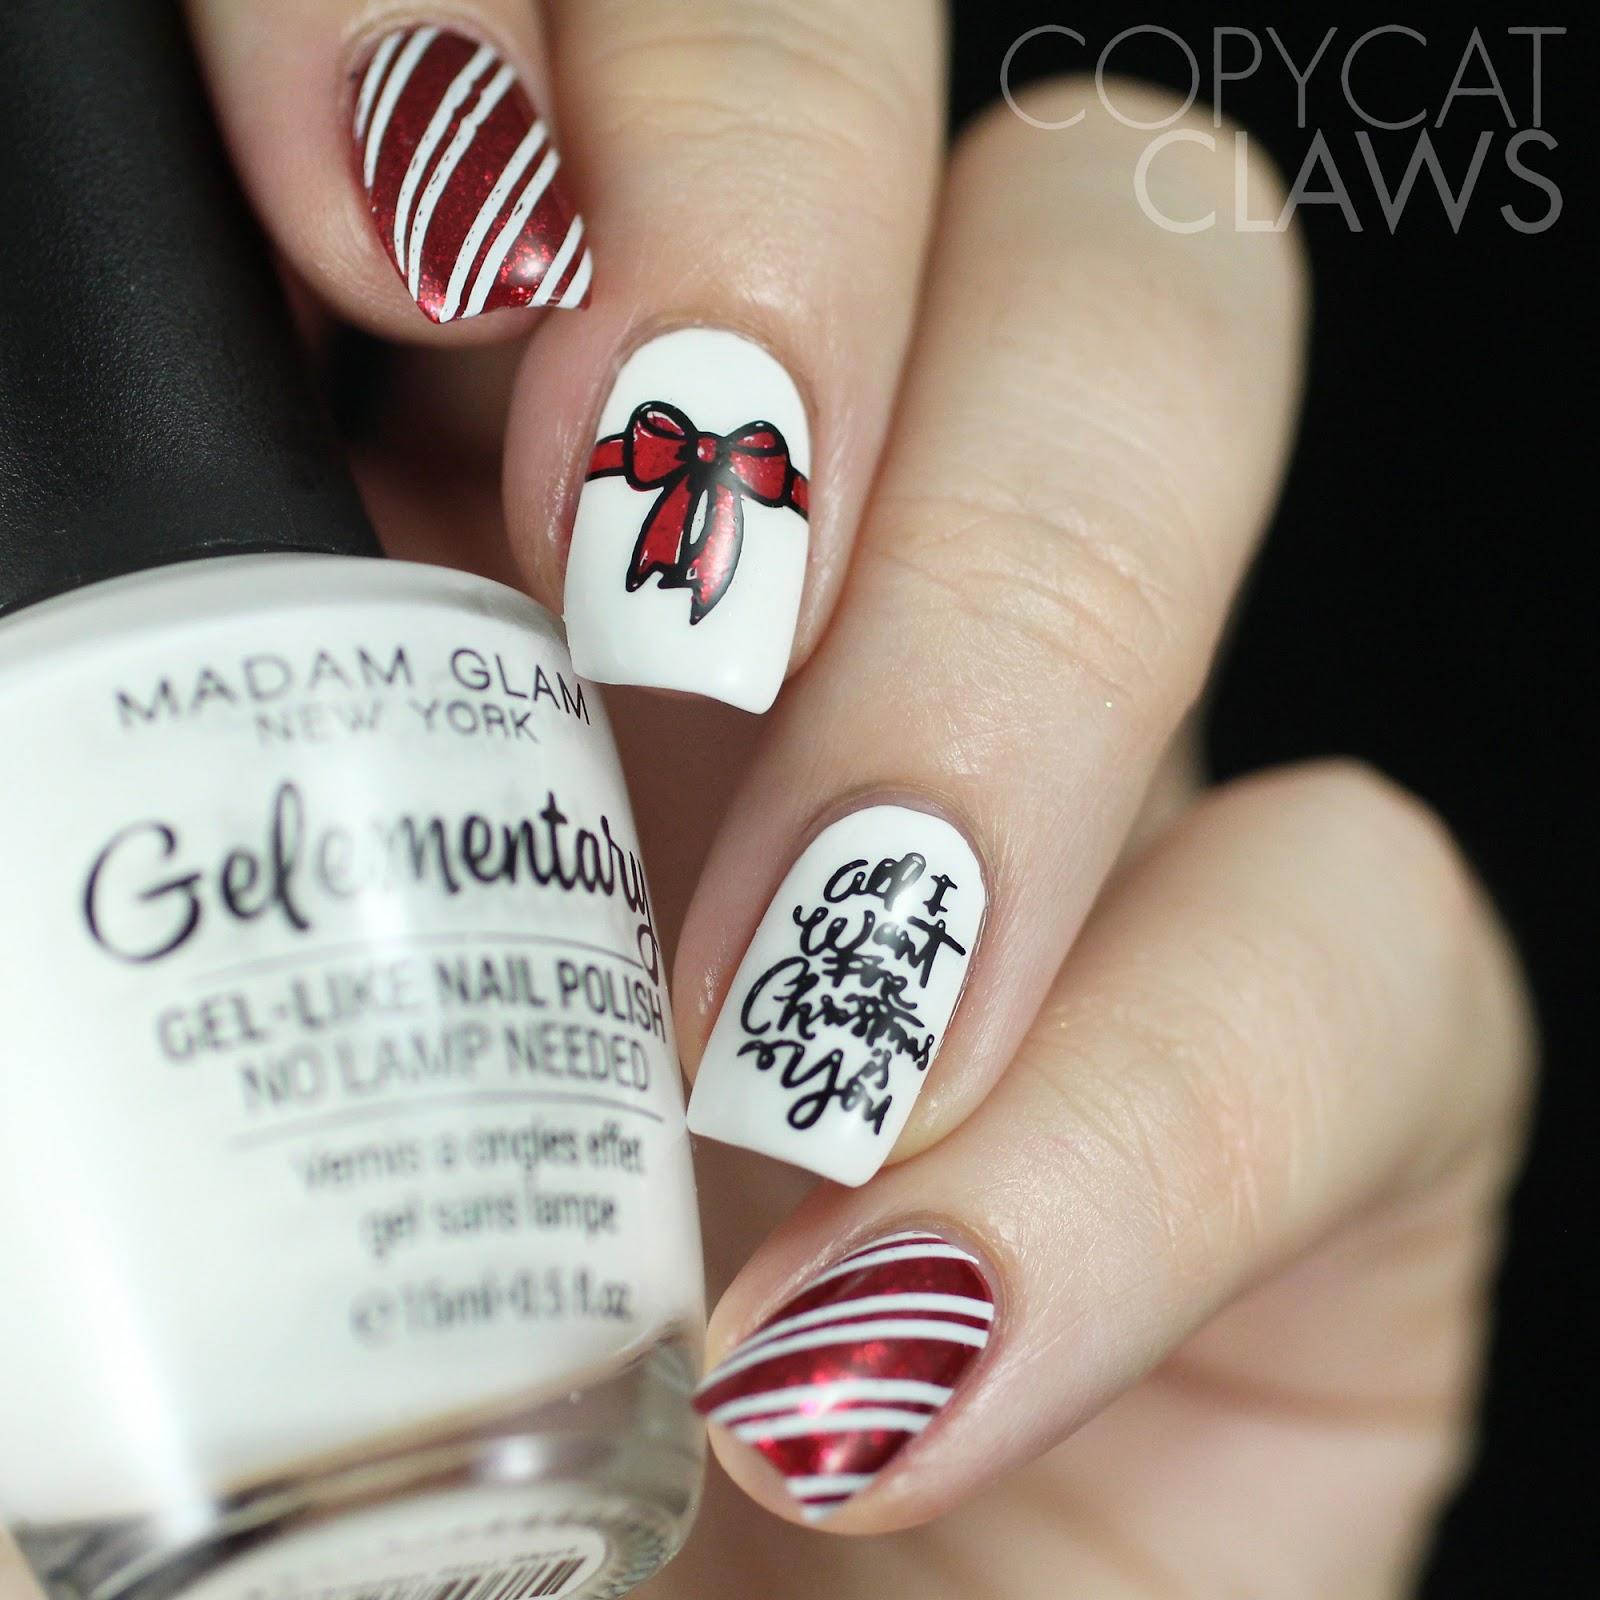 Copycat Claws: More Christmas Nail Art